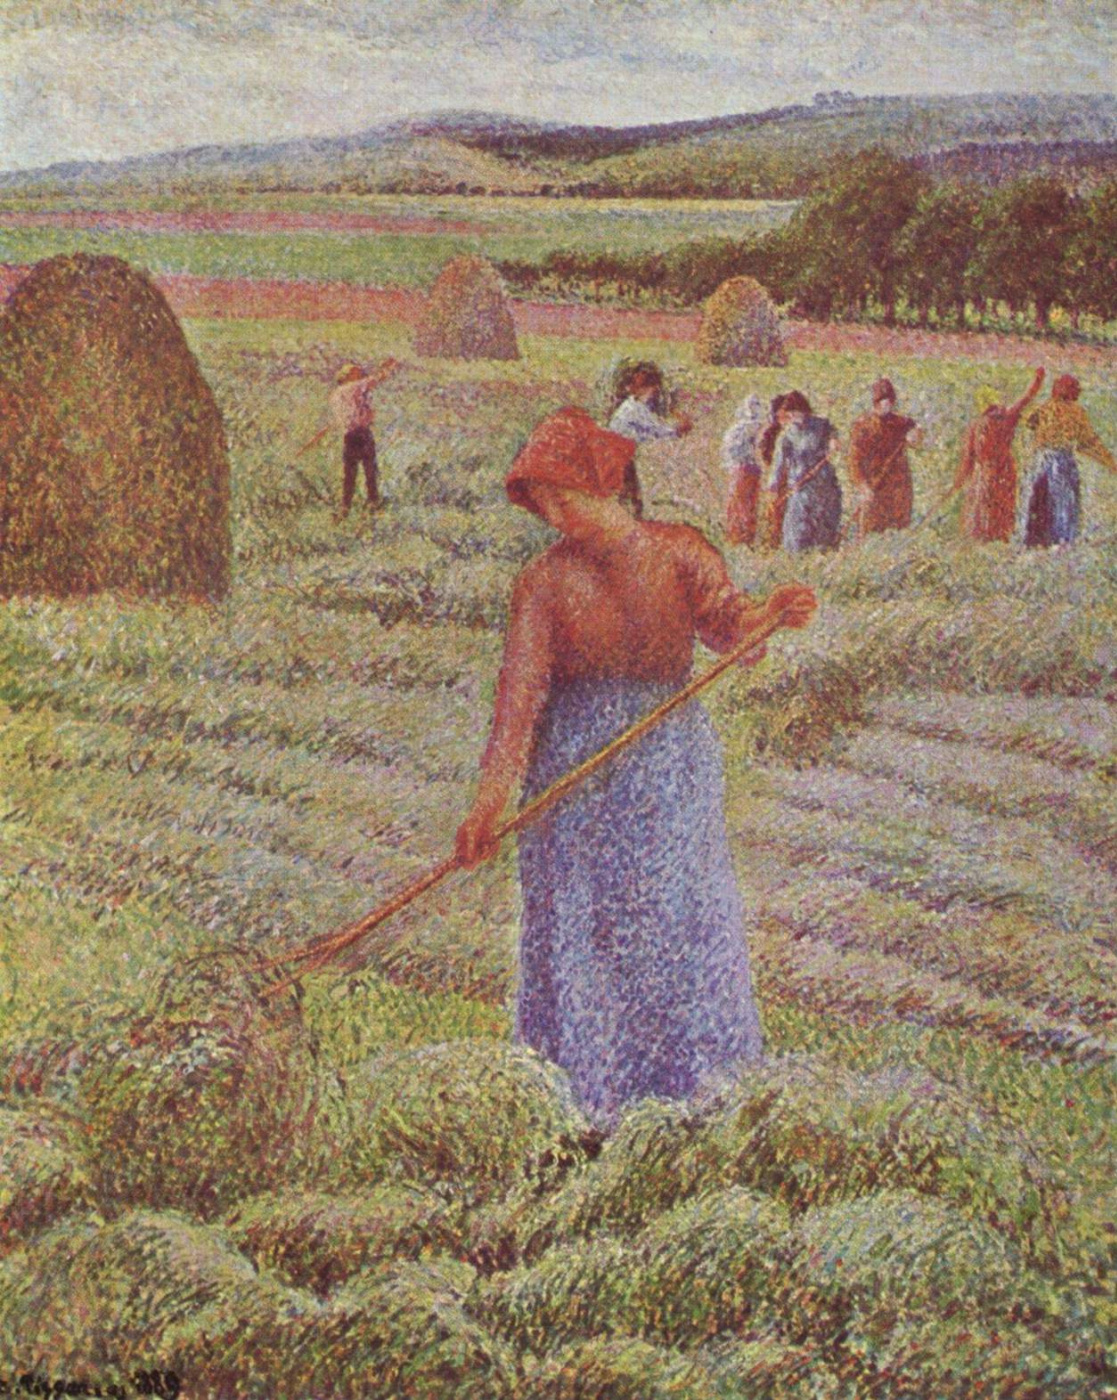 Camille Pissarro. Haymaking in Eragny